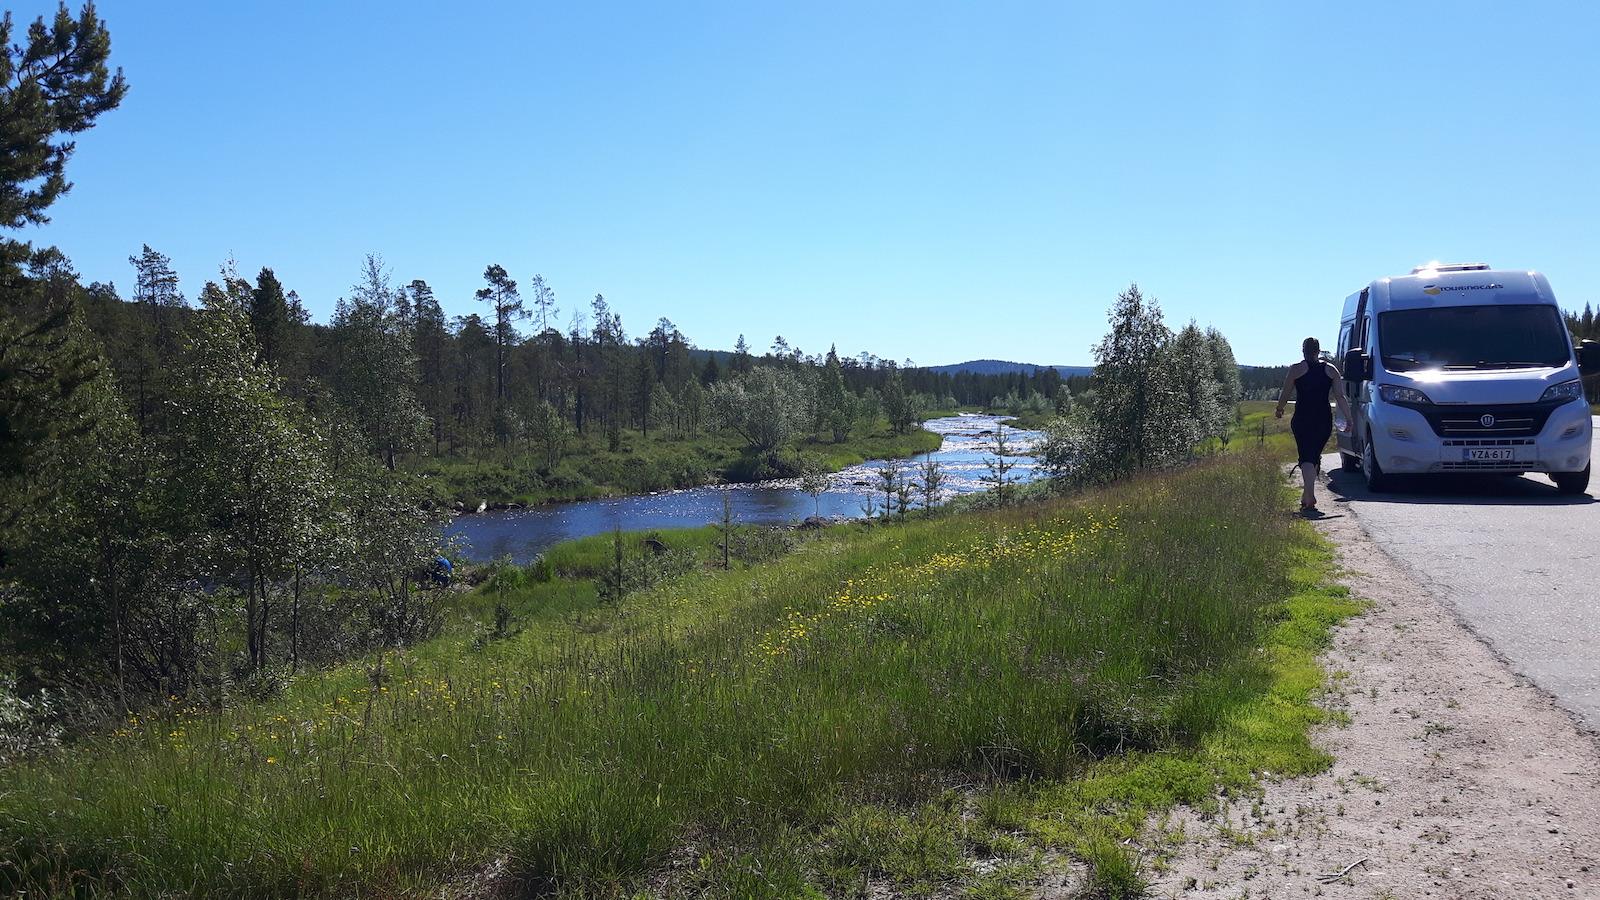 Nice stream near Inari Finland